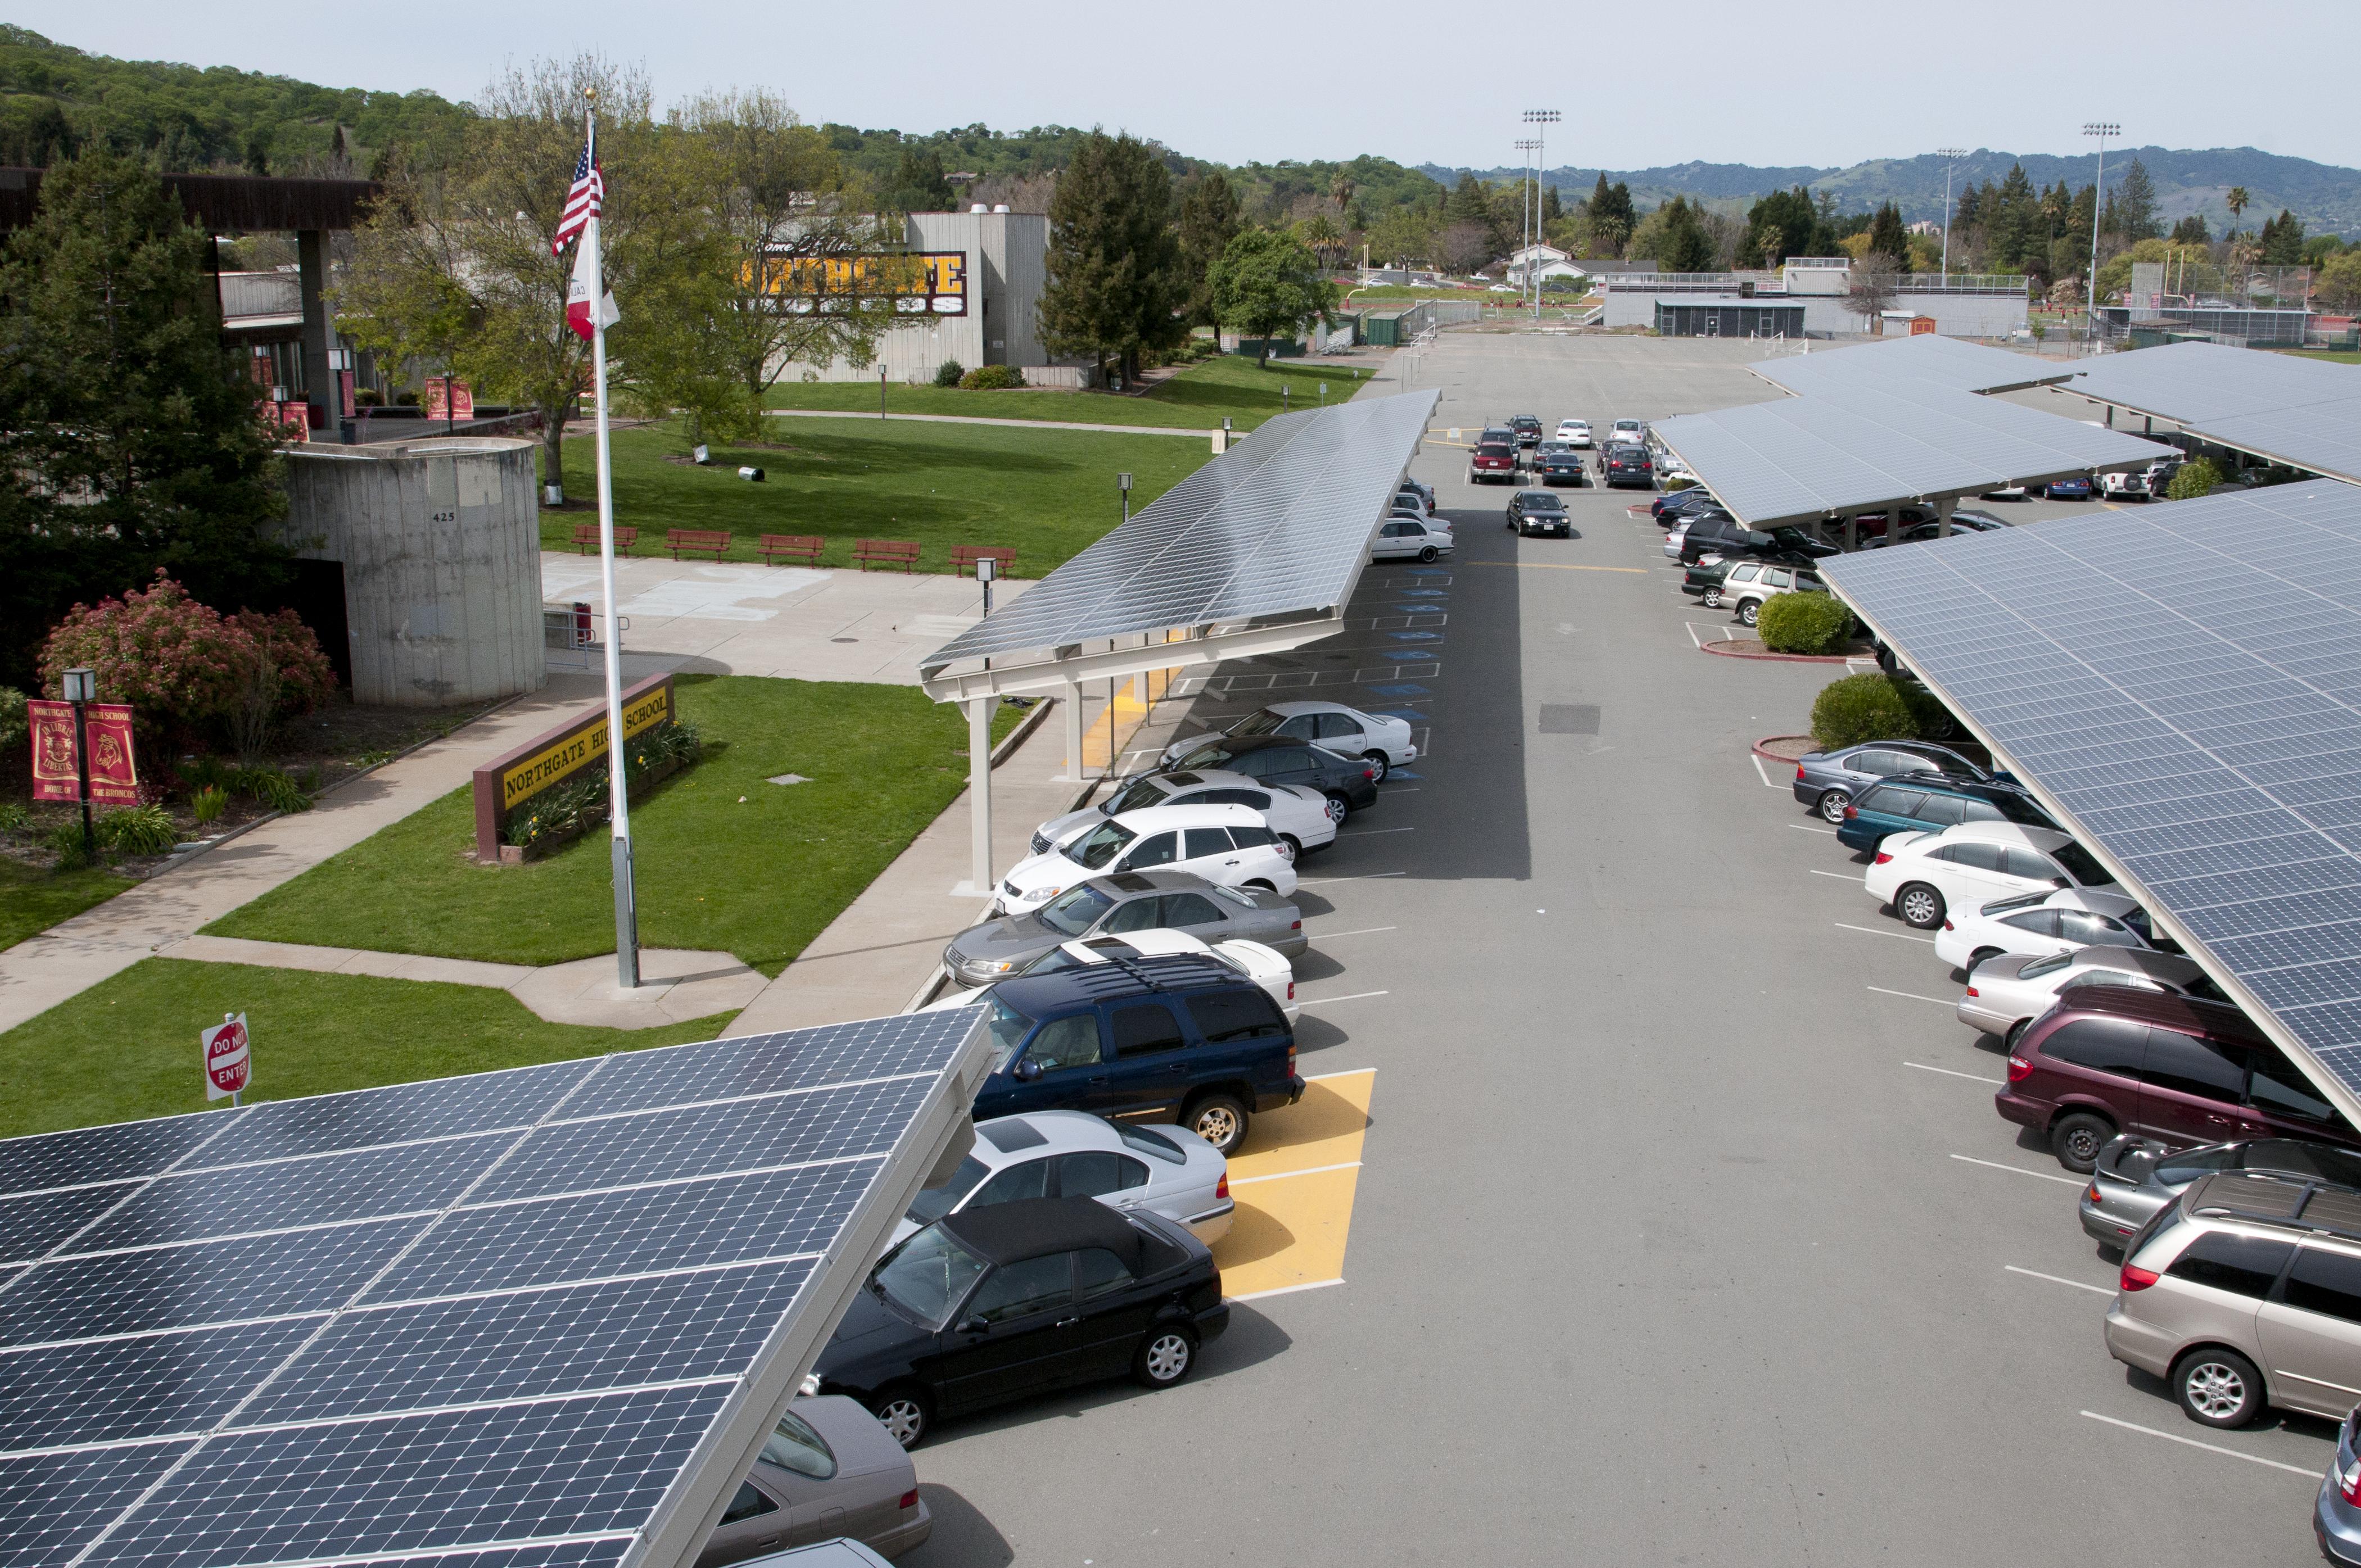 Solar carport using SunPower solar panels.